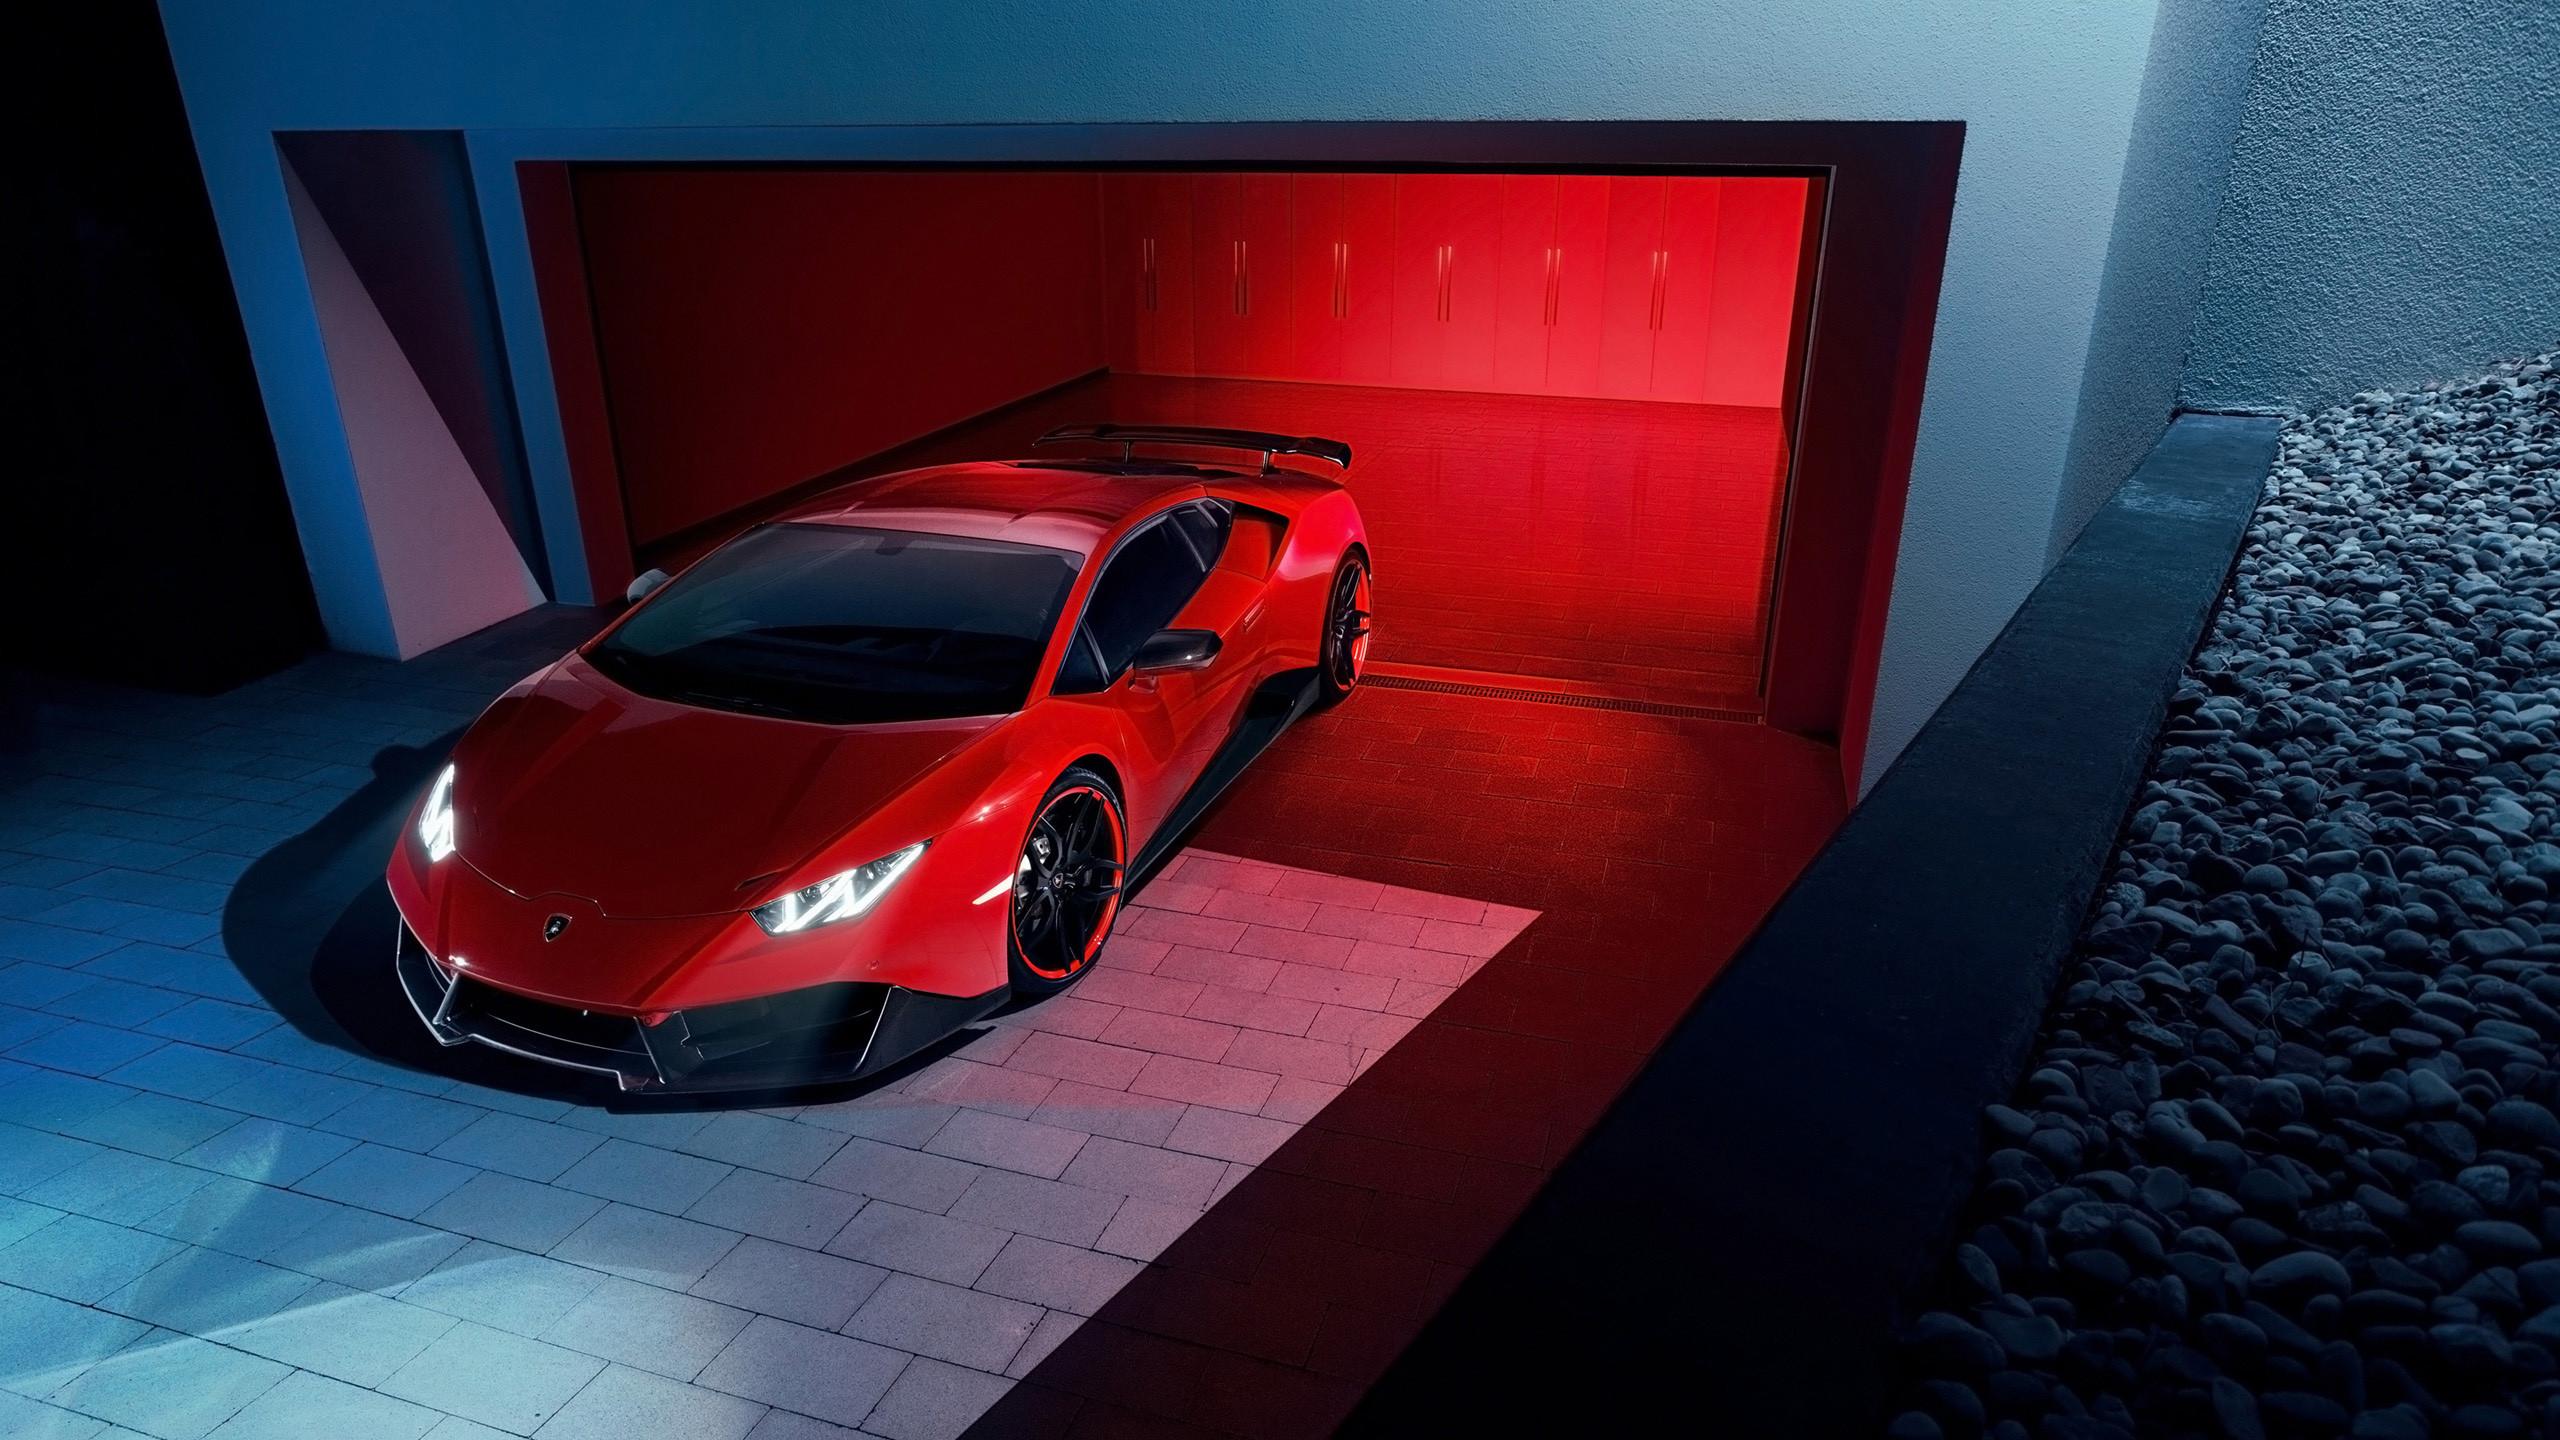 Lamborghini Wallpaper High Definition #TiC